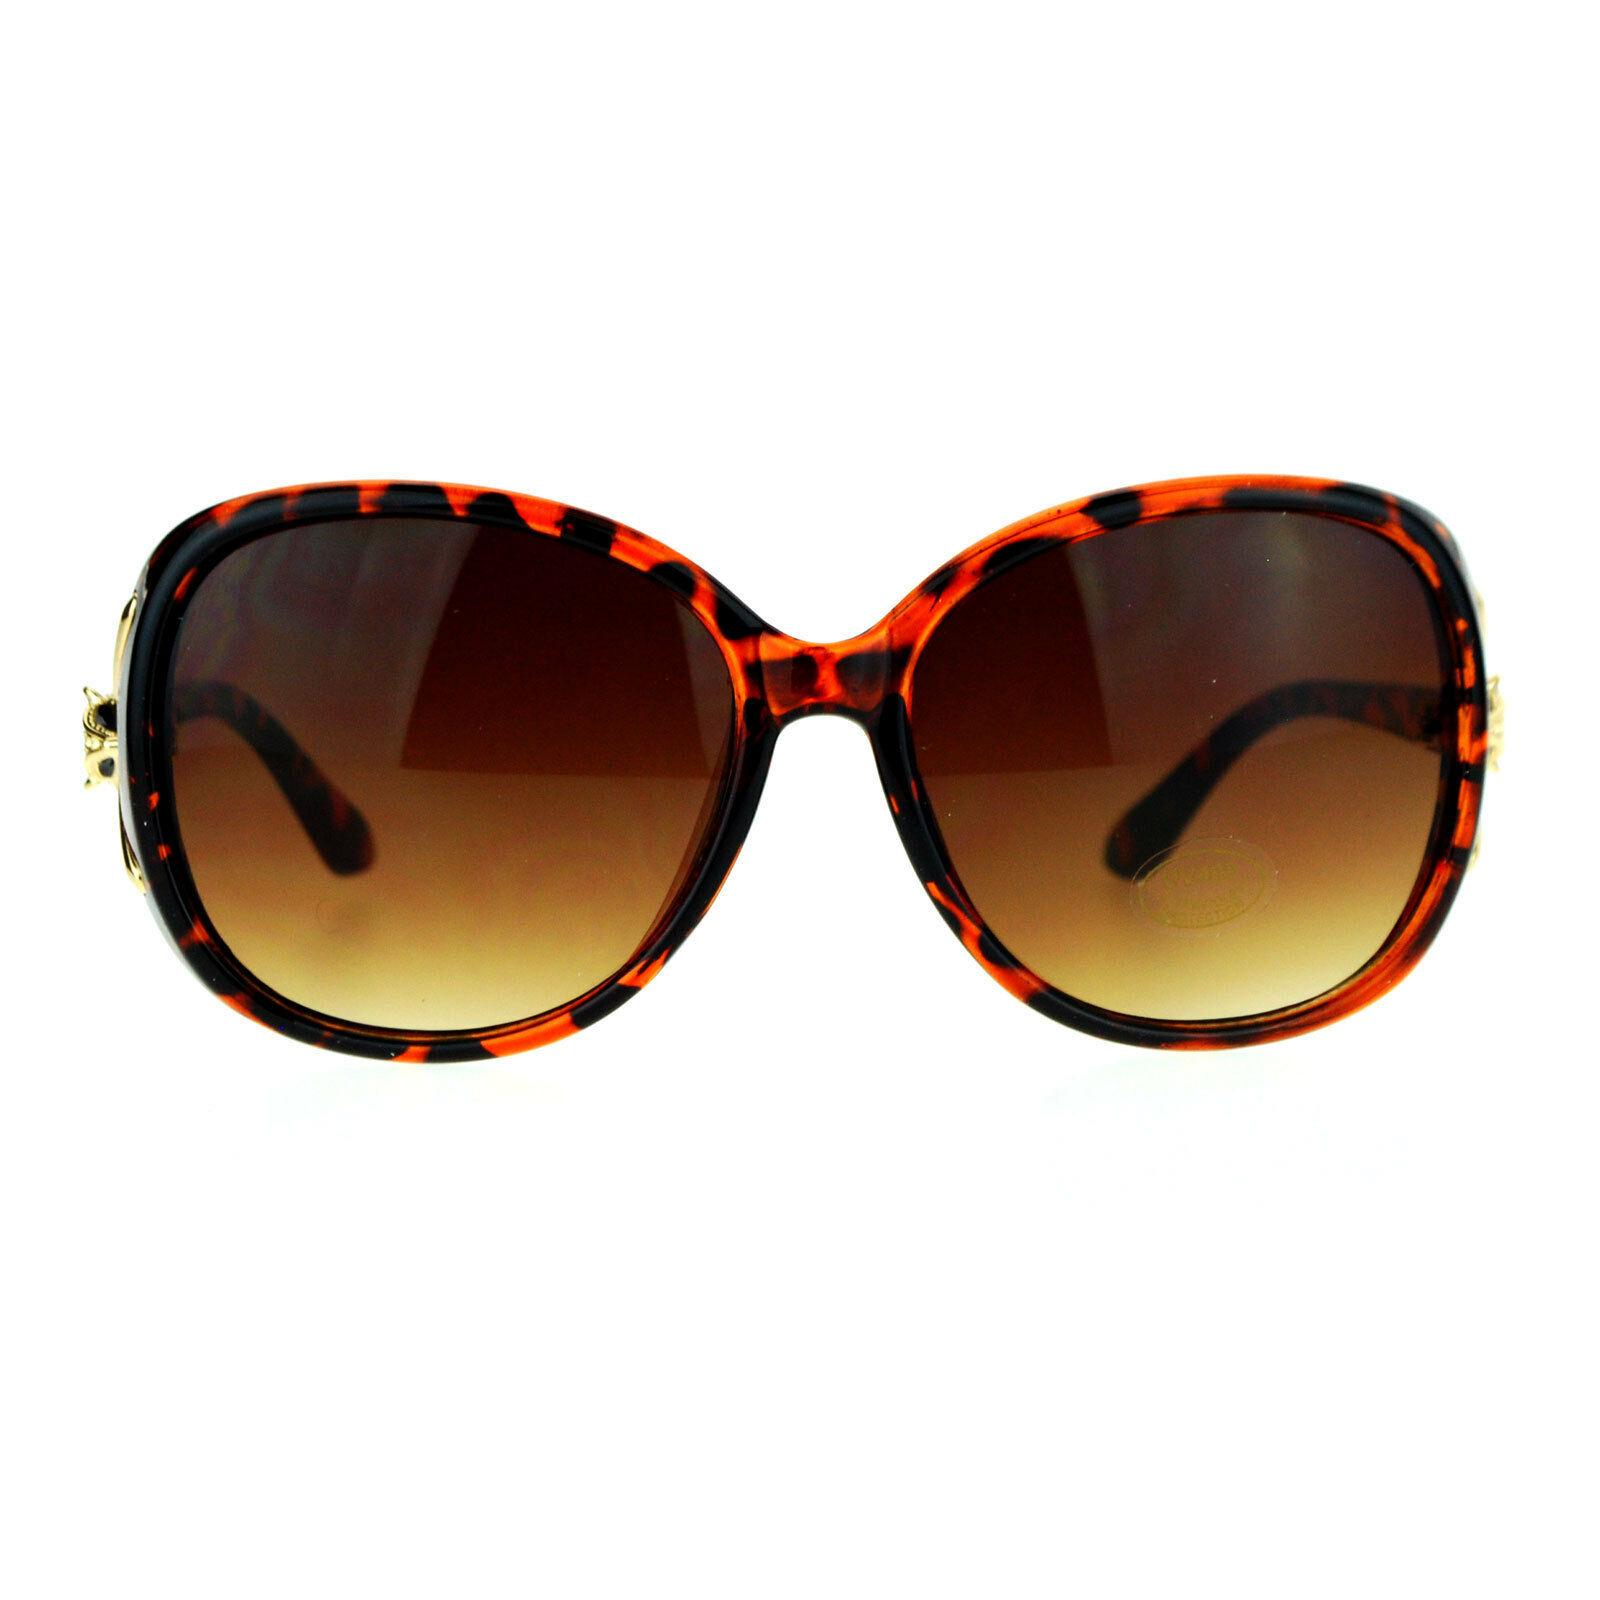 Womens Fashion Sunglasses Round Square Fox Design Shades UV 400